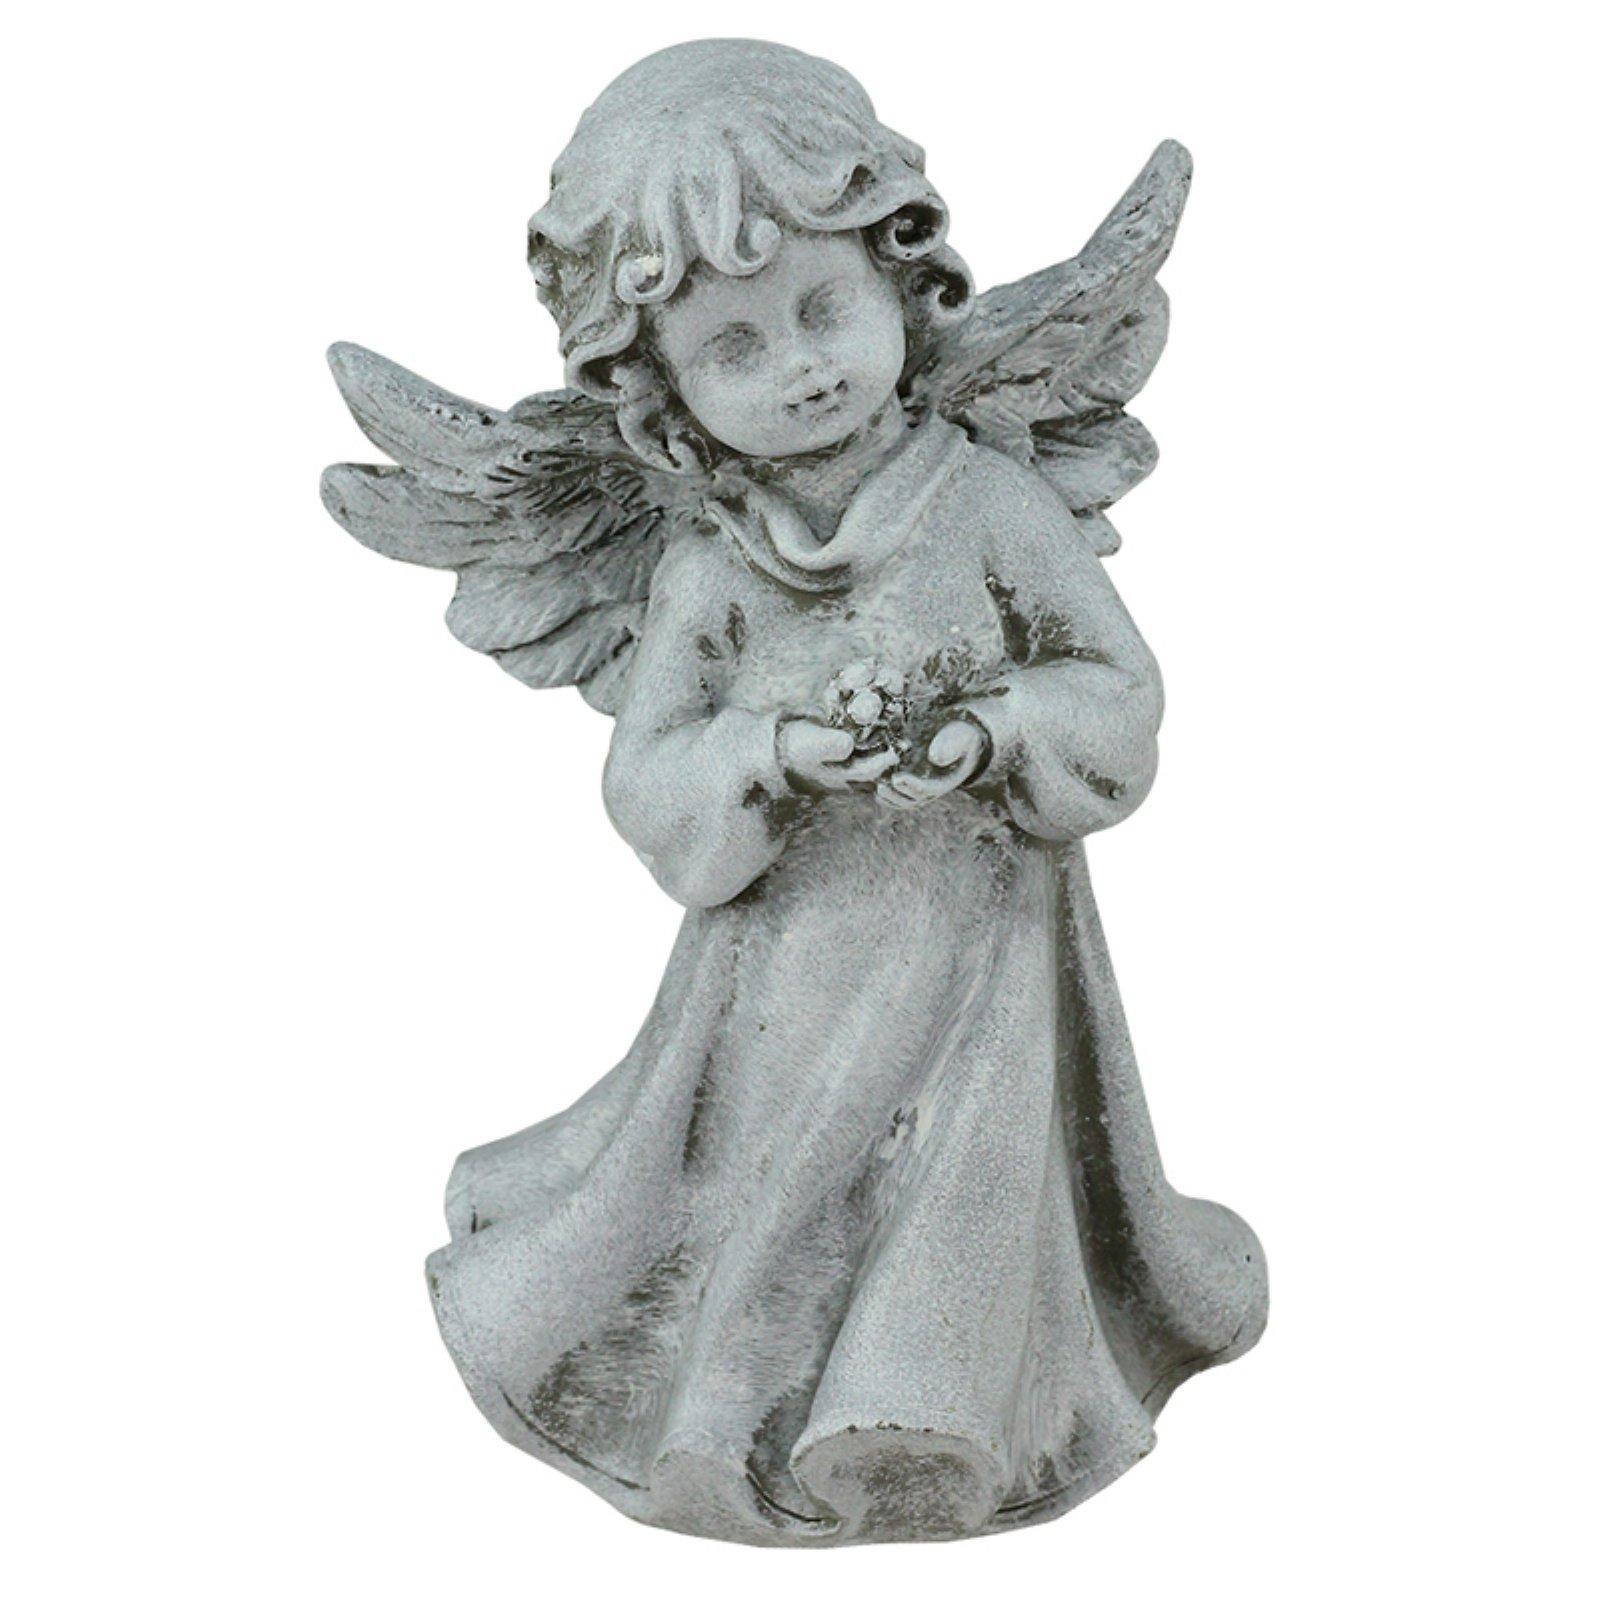 Northlight Heavenly Gardens Cherub Angel Girl with Flower Outdoor Garden Statue by Northlight